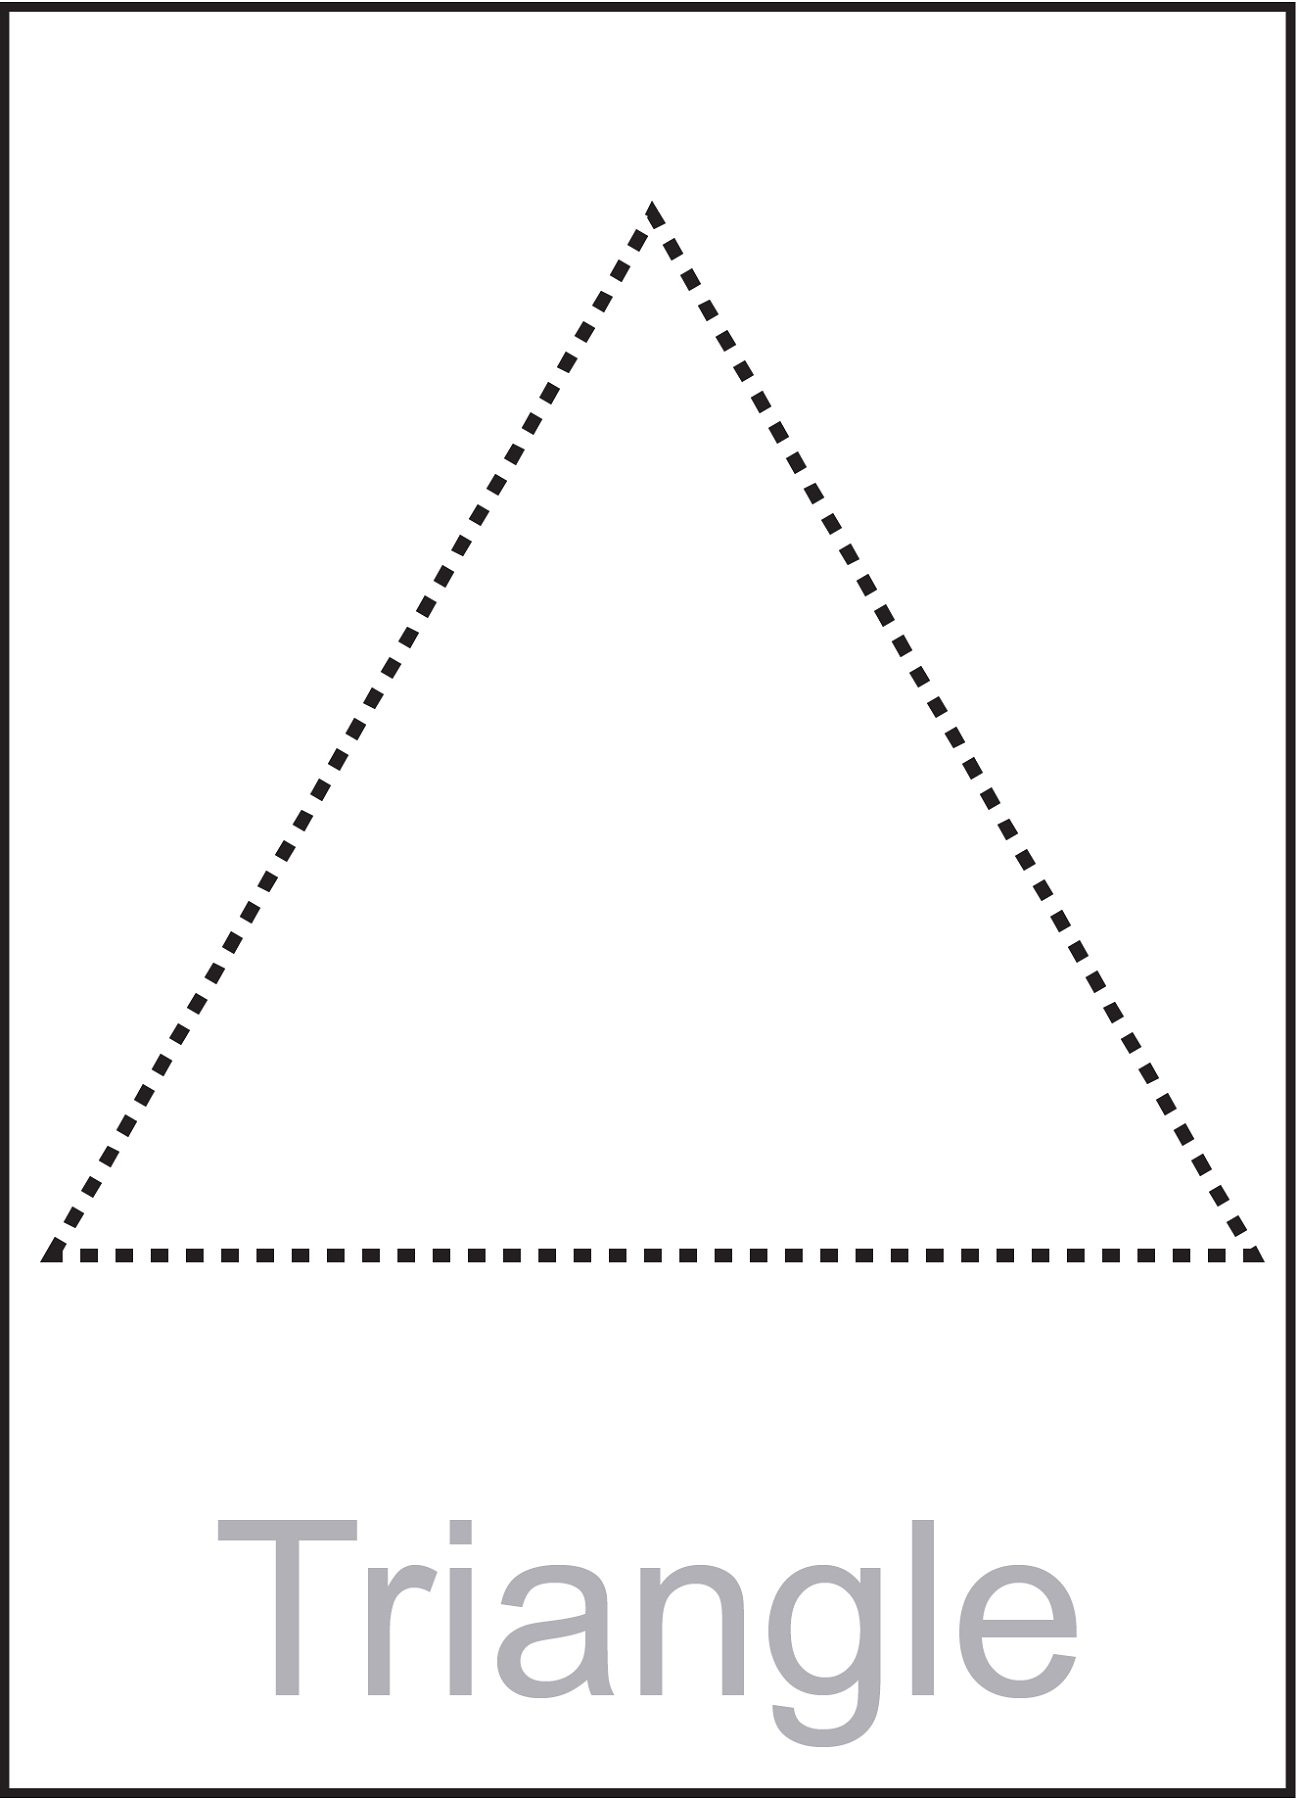 Triangle Worksheet for Pre-K